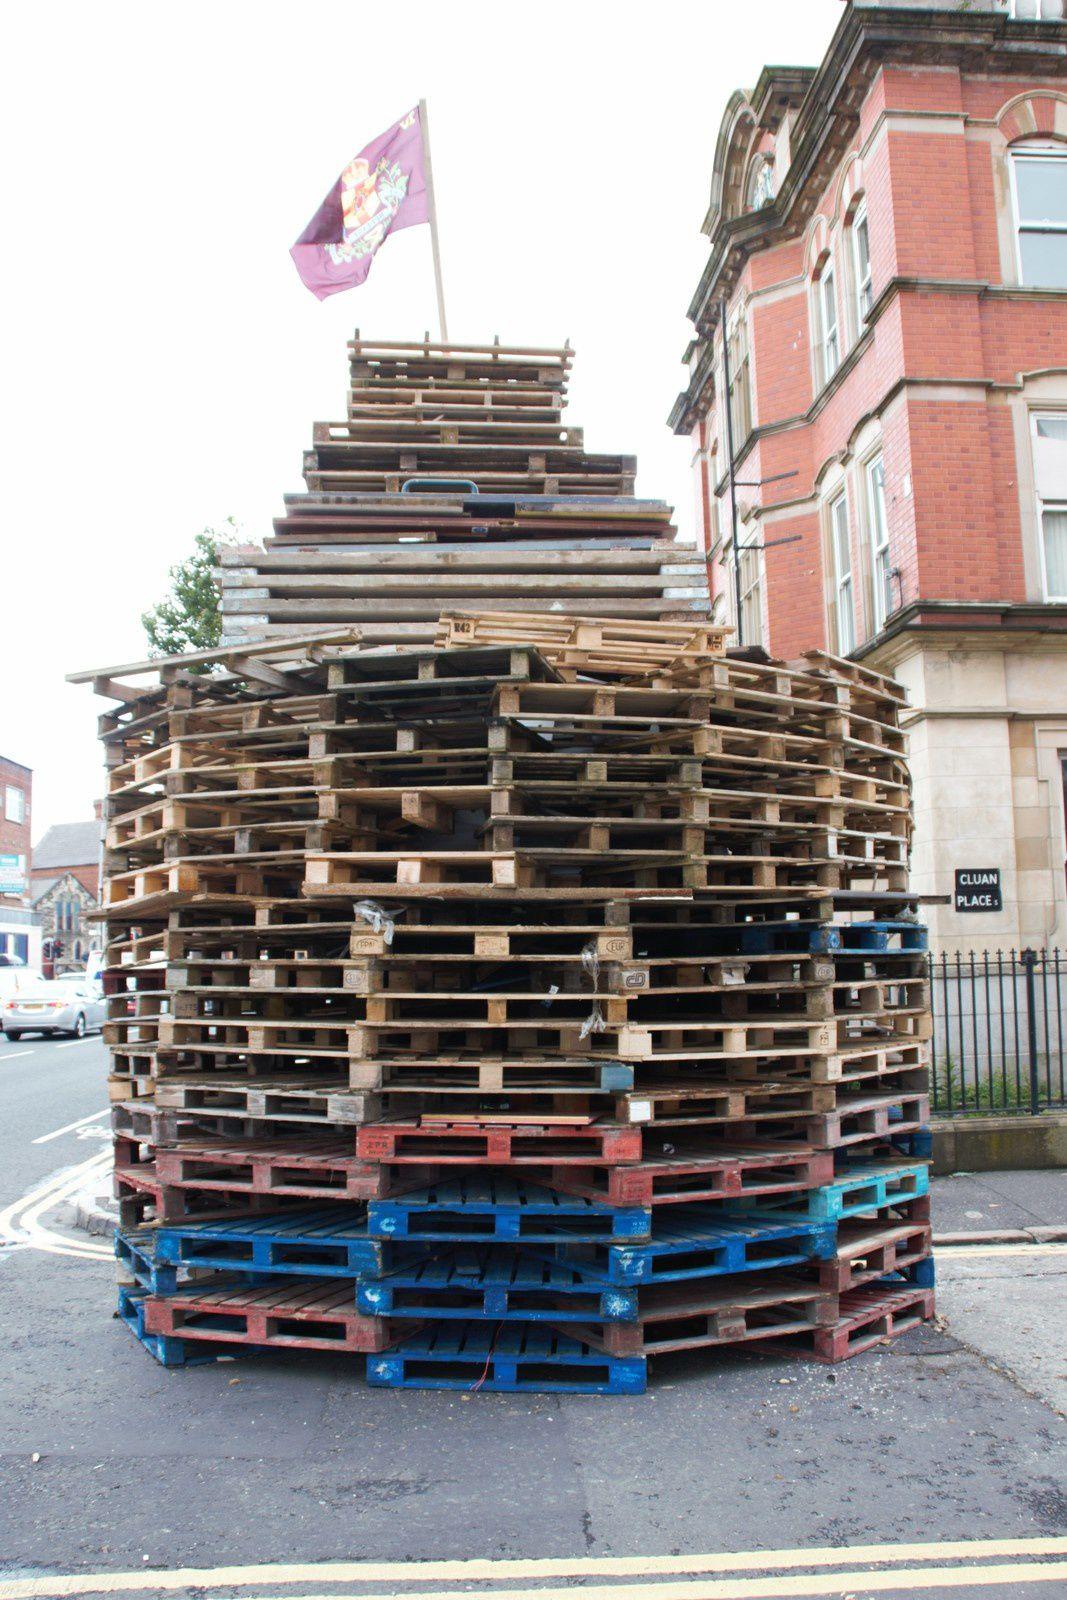 659) Cluan Place, East Belfast